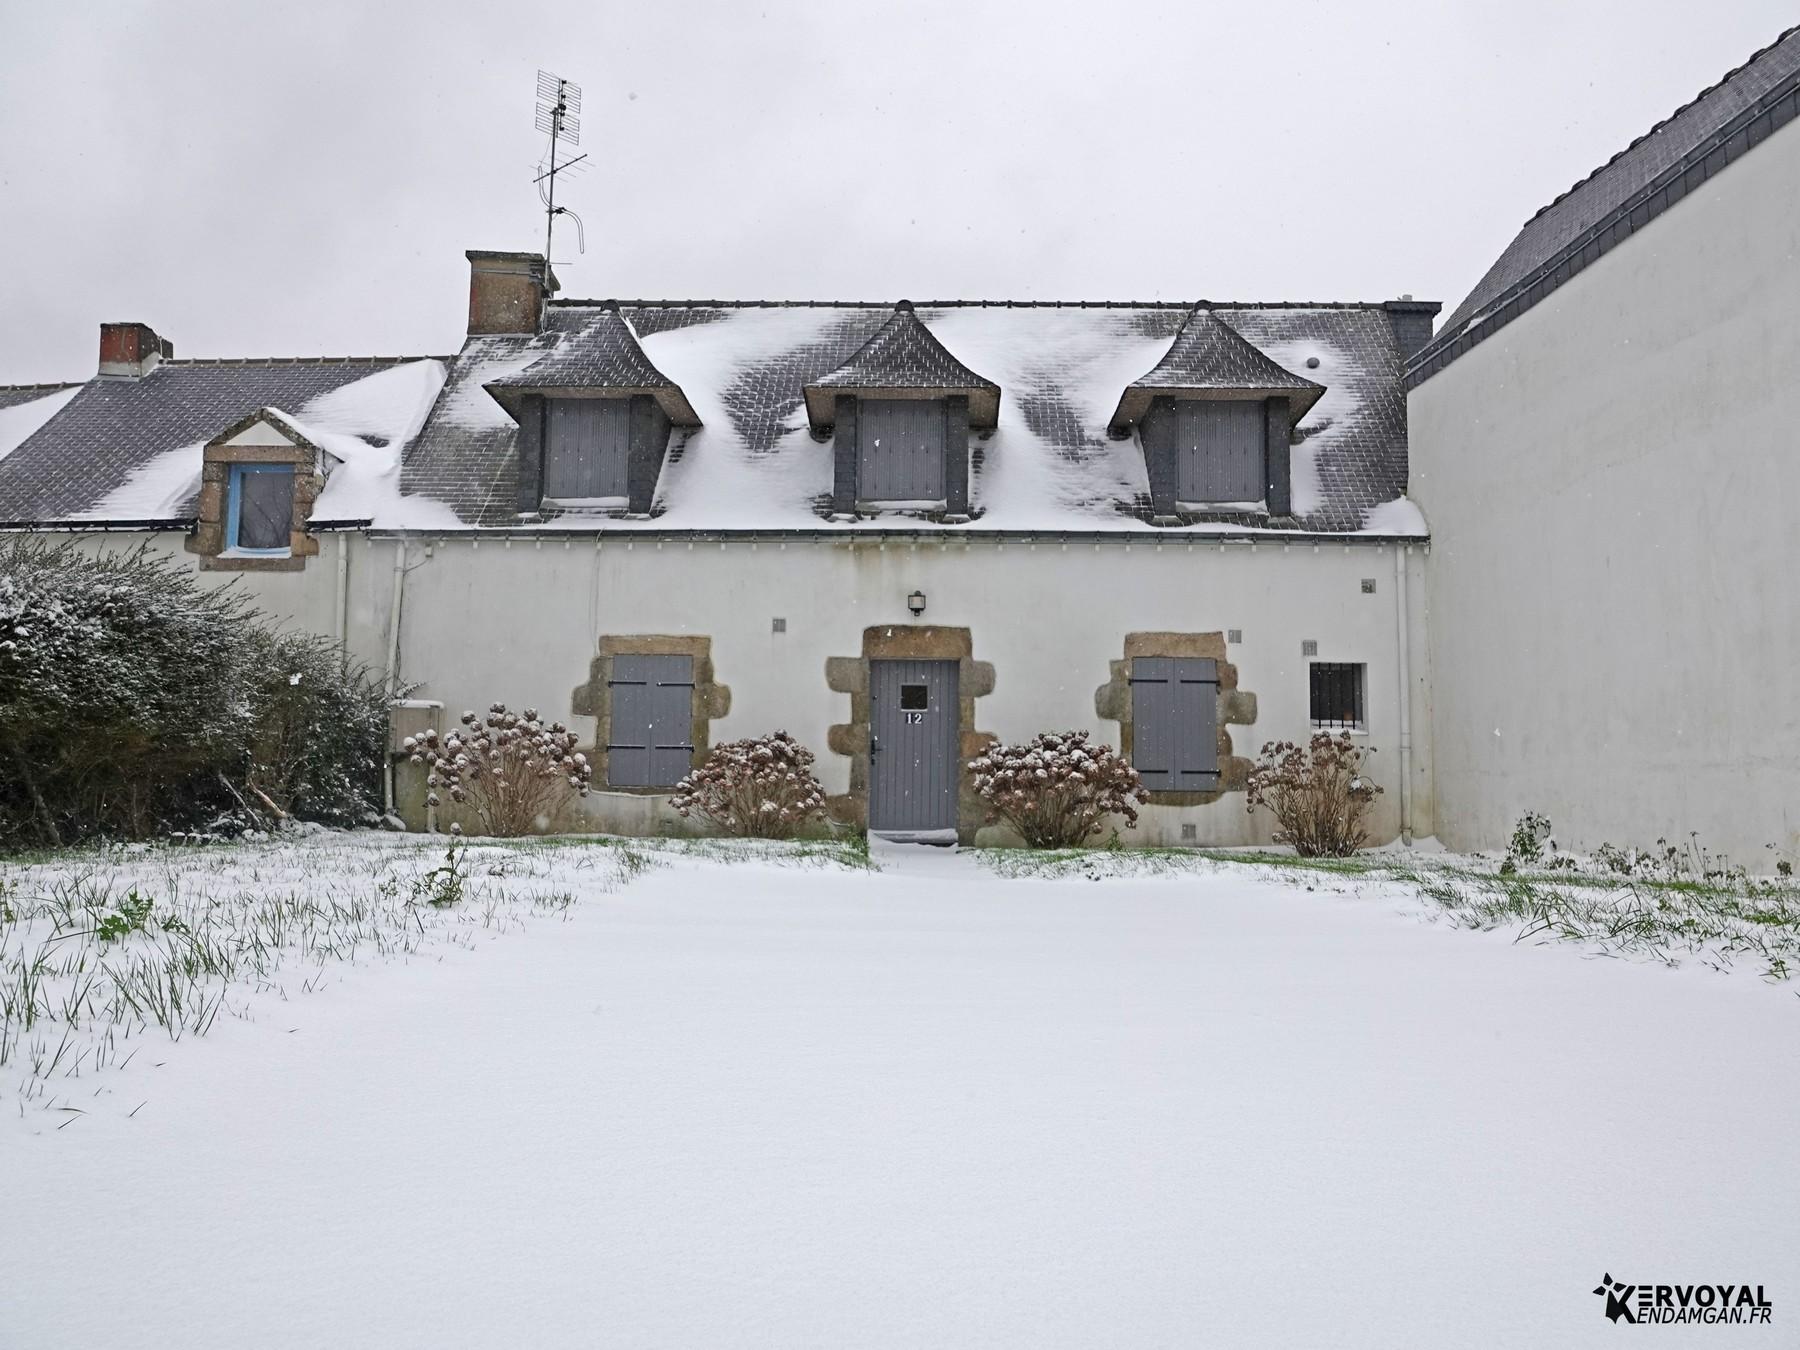 neige à kervoyal 11 février 2021 damgan morbihan (15)